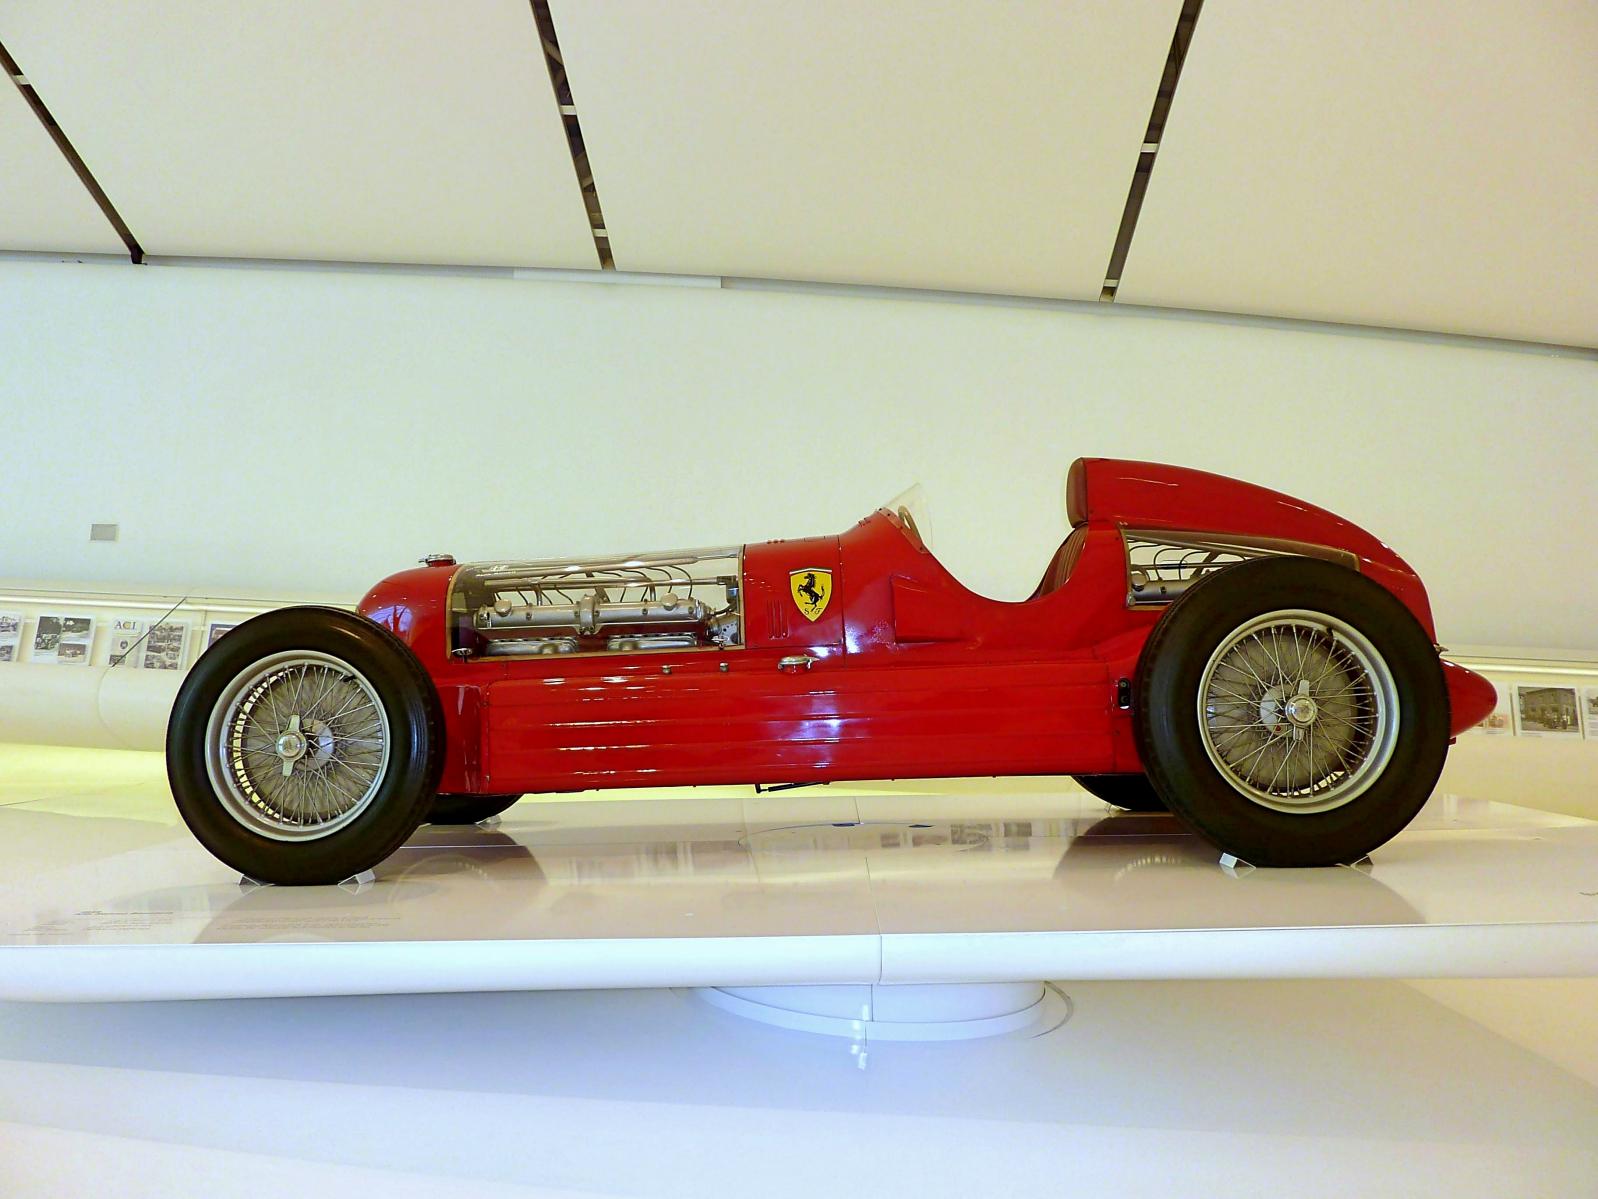 1935 Alfa Romeo 16C Bimotore (4)